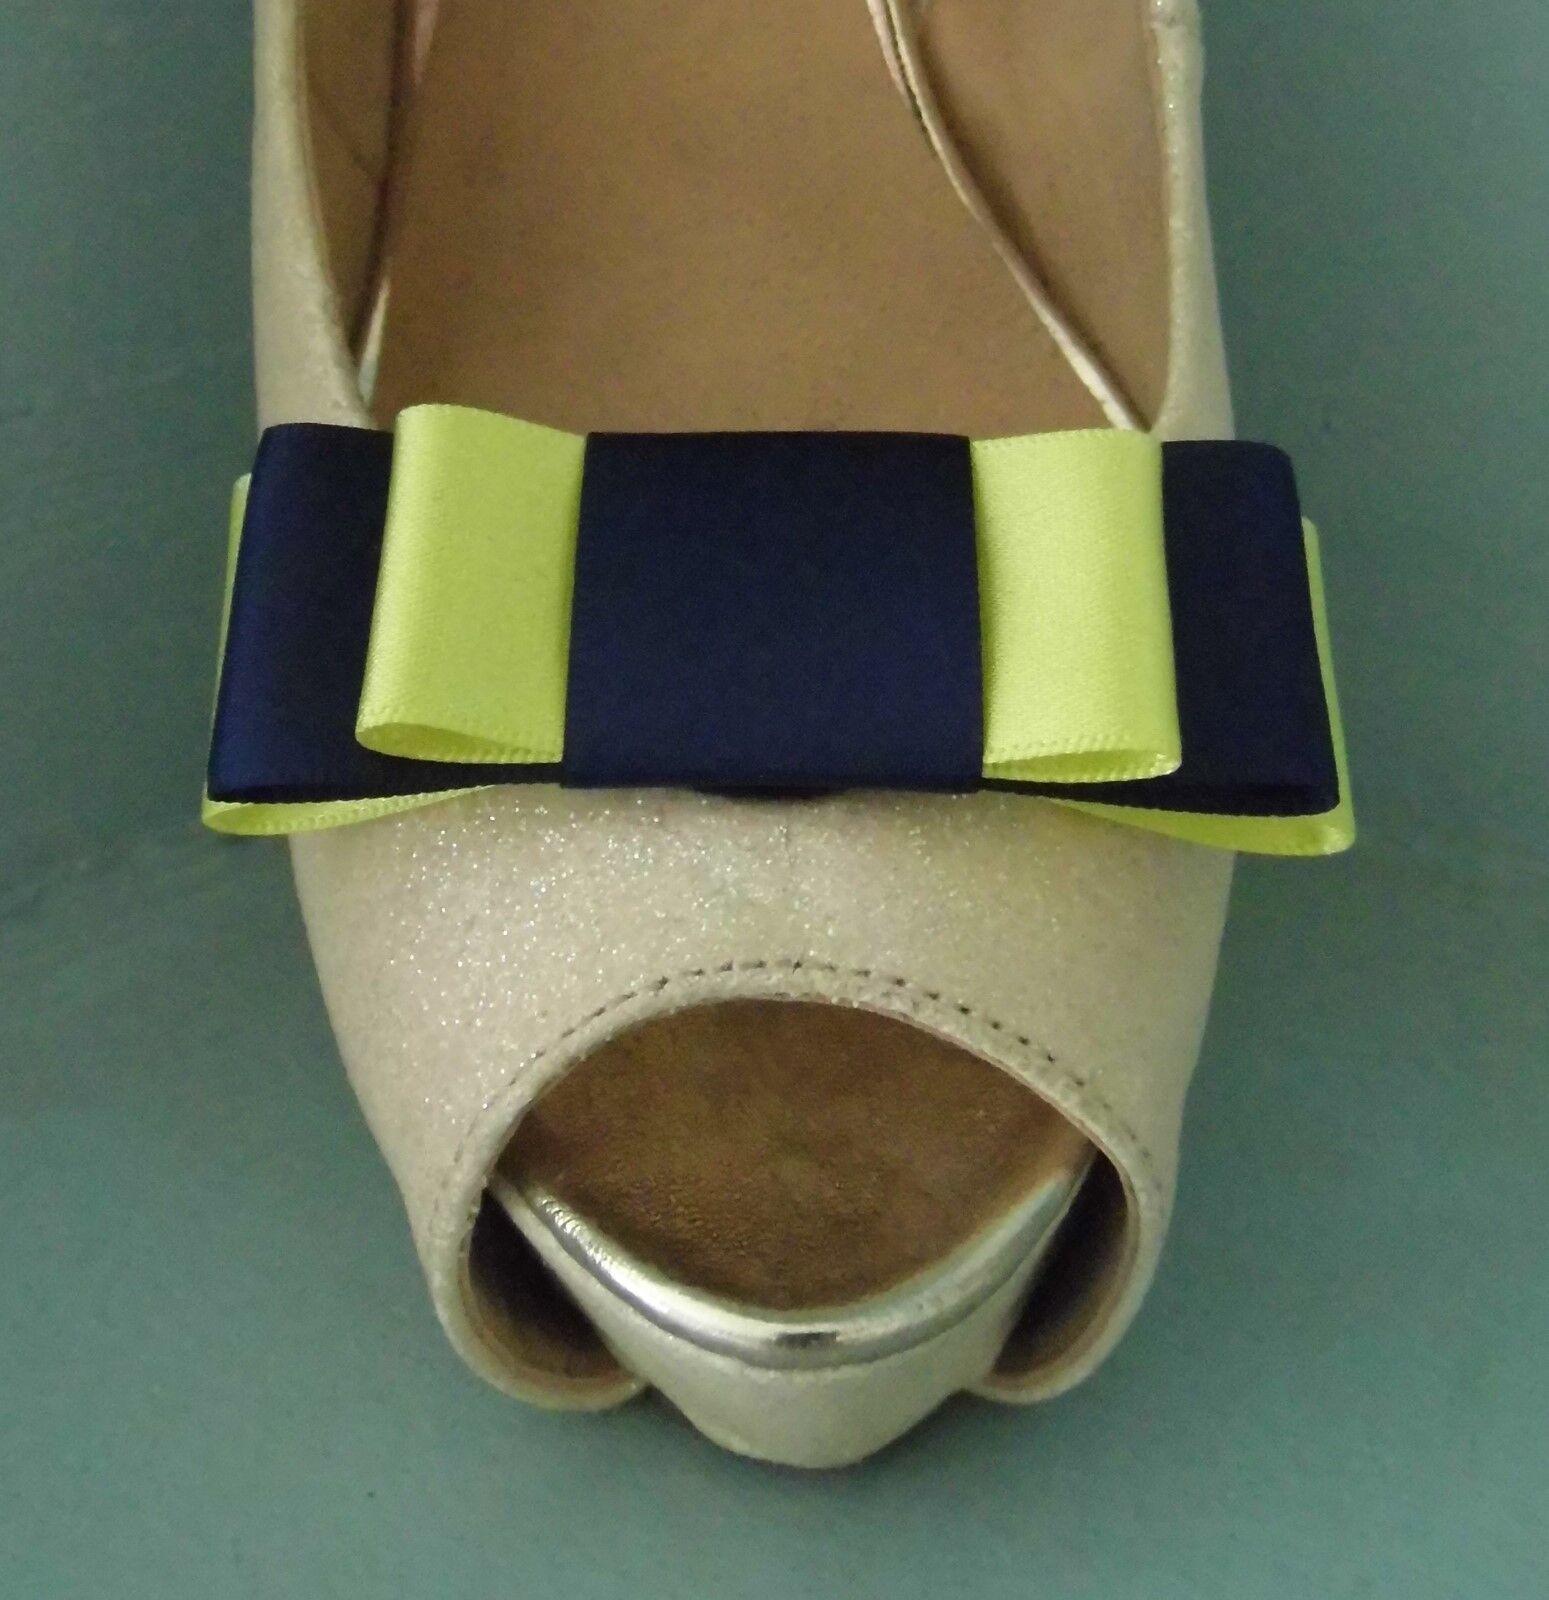 2 Handmade Navy & Lemon Triple Bow Clips for Shoes